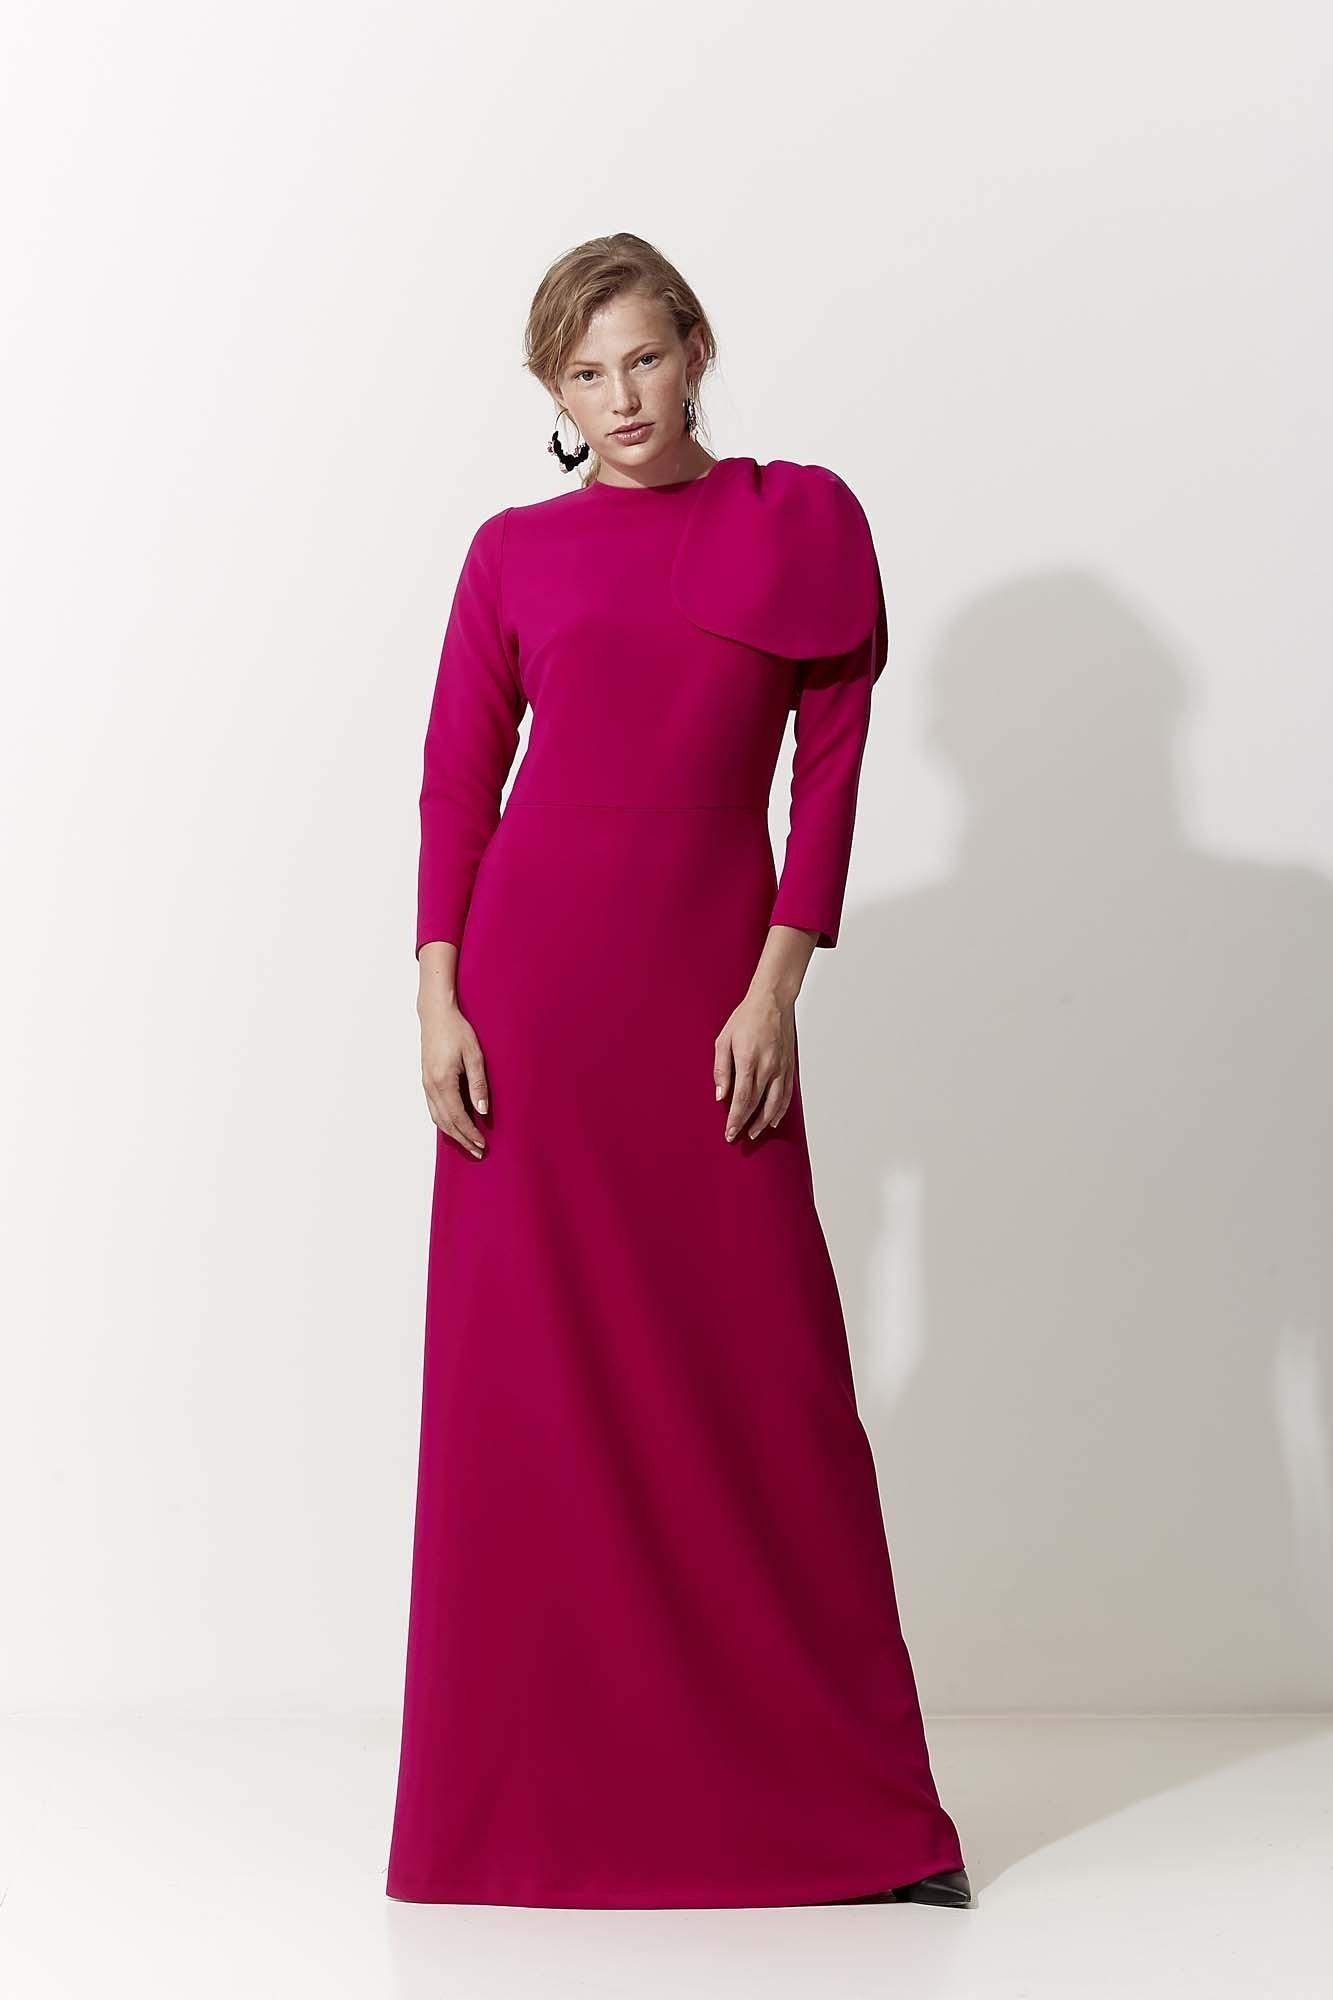 MAANT DRESS